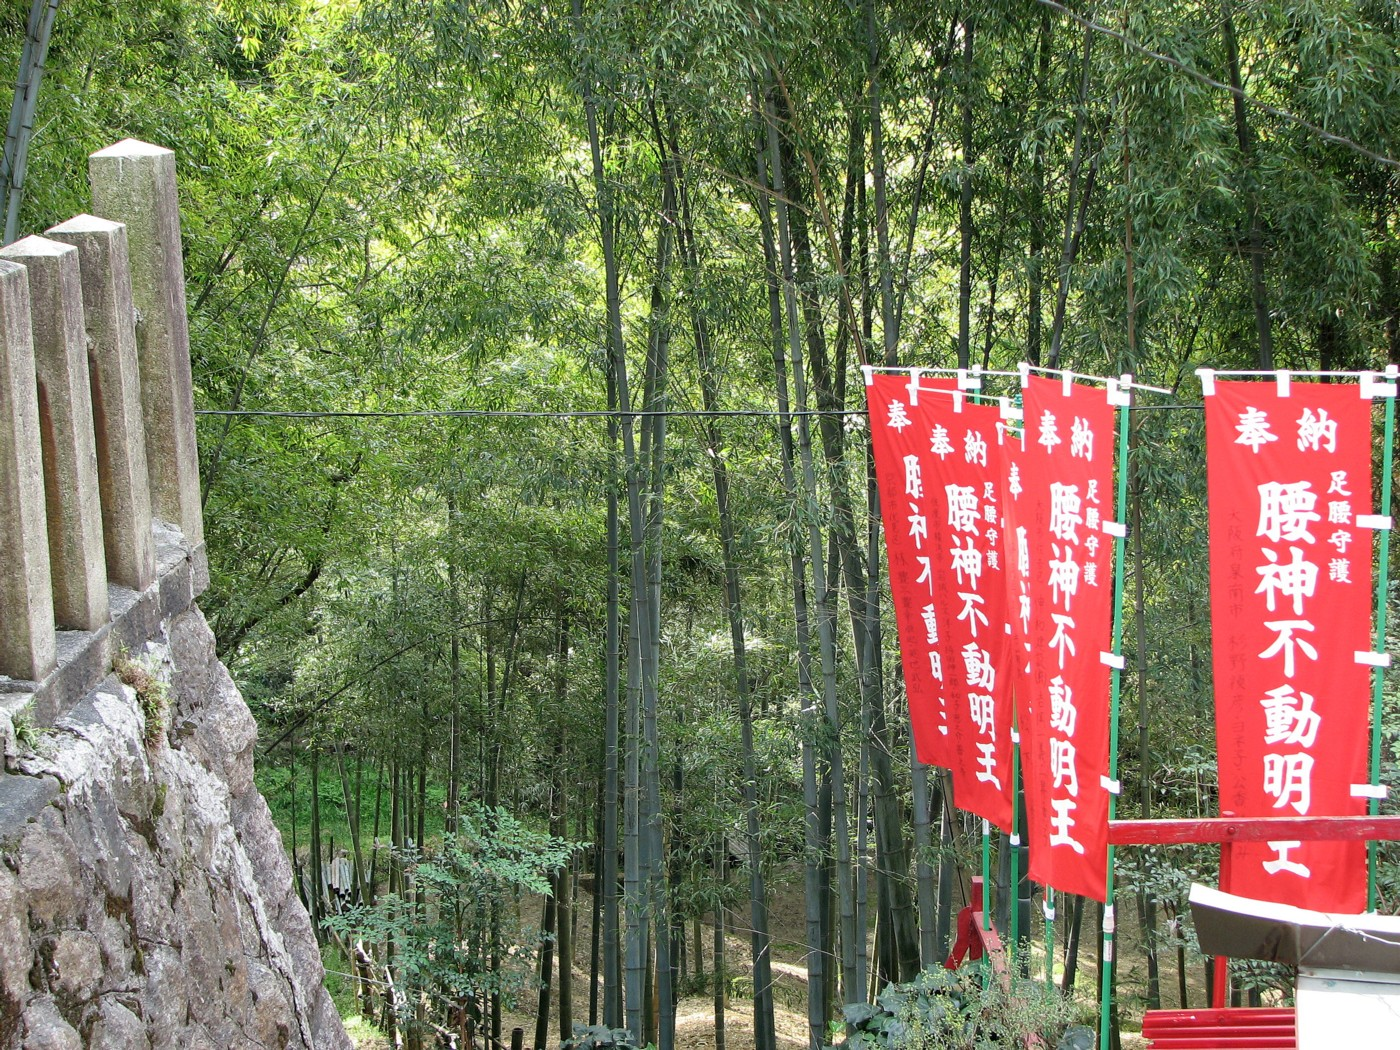 bamboo Fushimi Inari Taisha 伏見稲荷大社